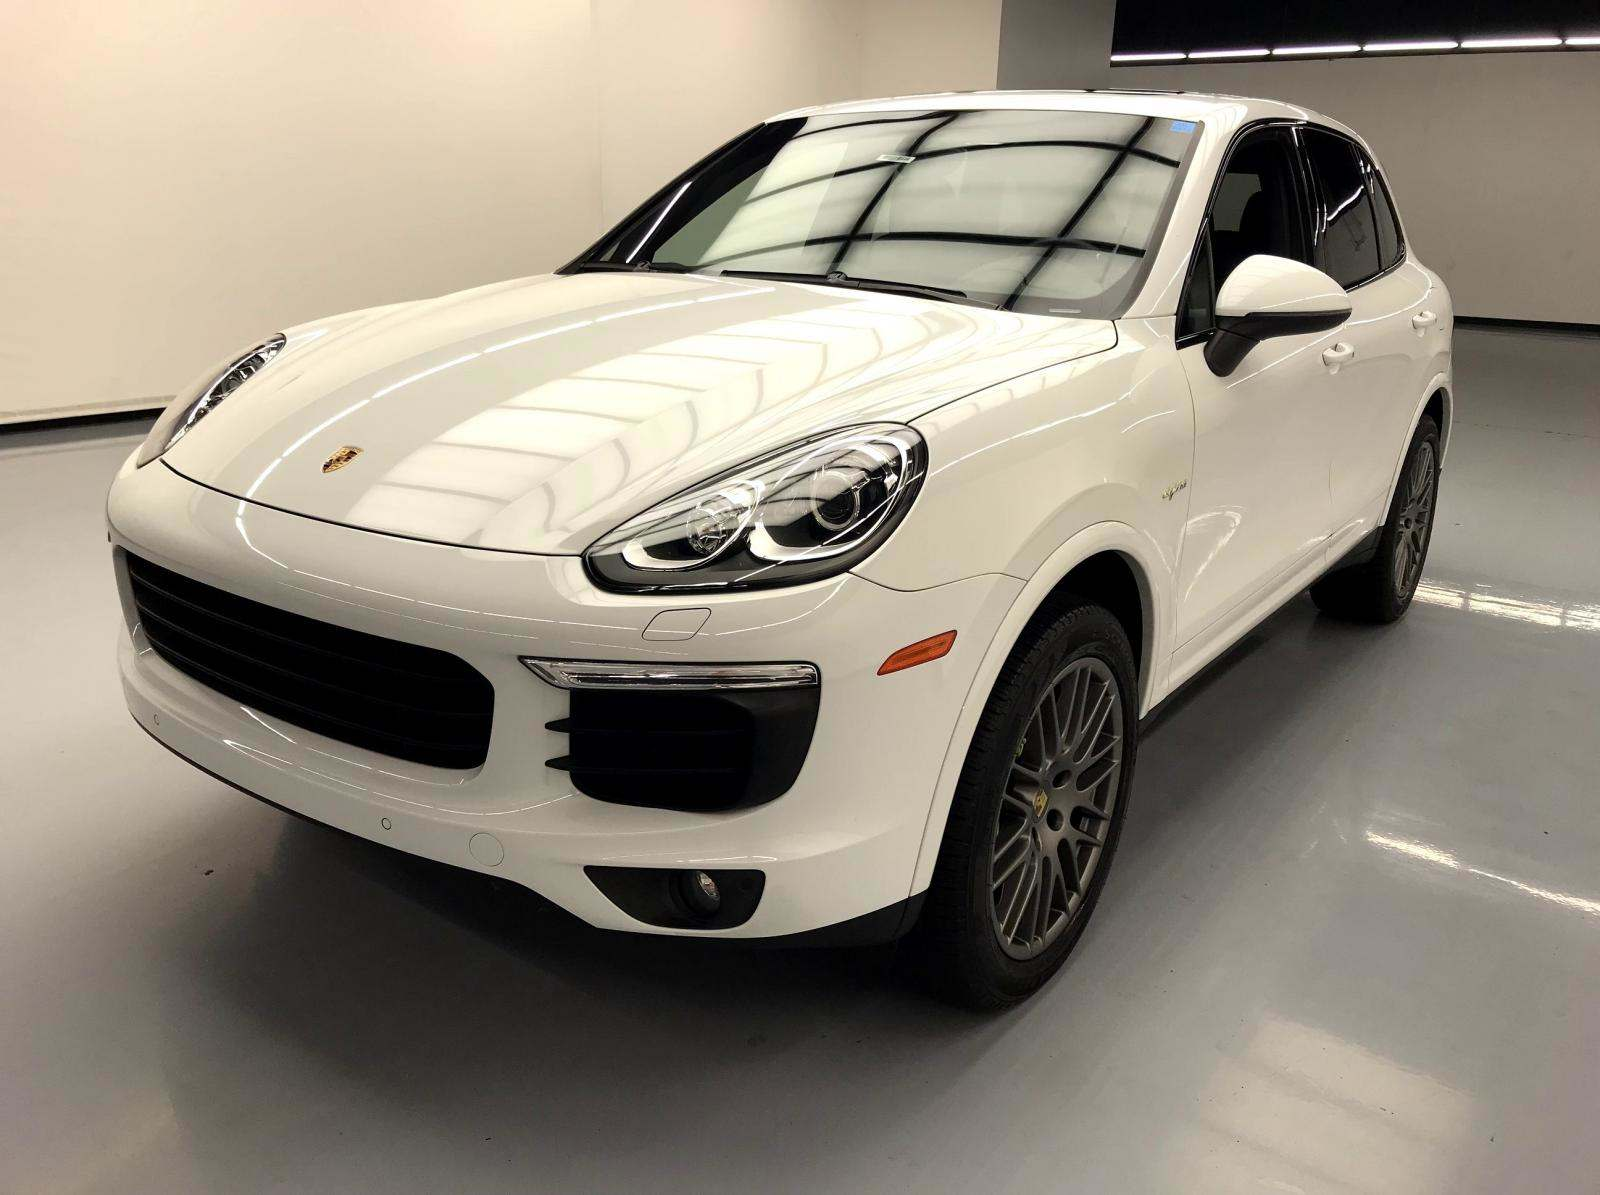 used Porsche Cayenne 2018 vin: WP1AE2A24JLA72447